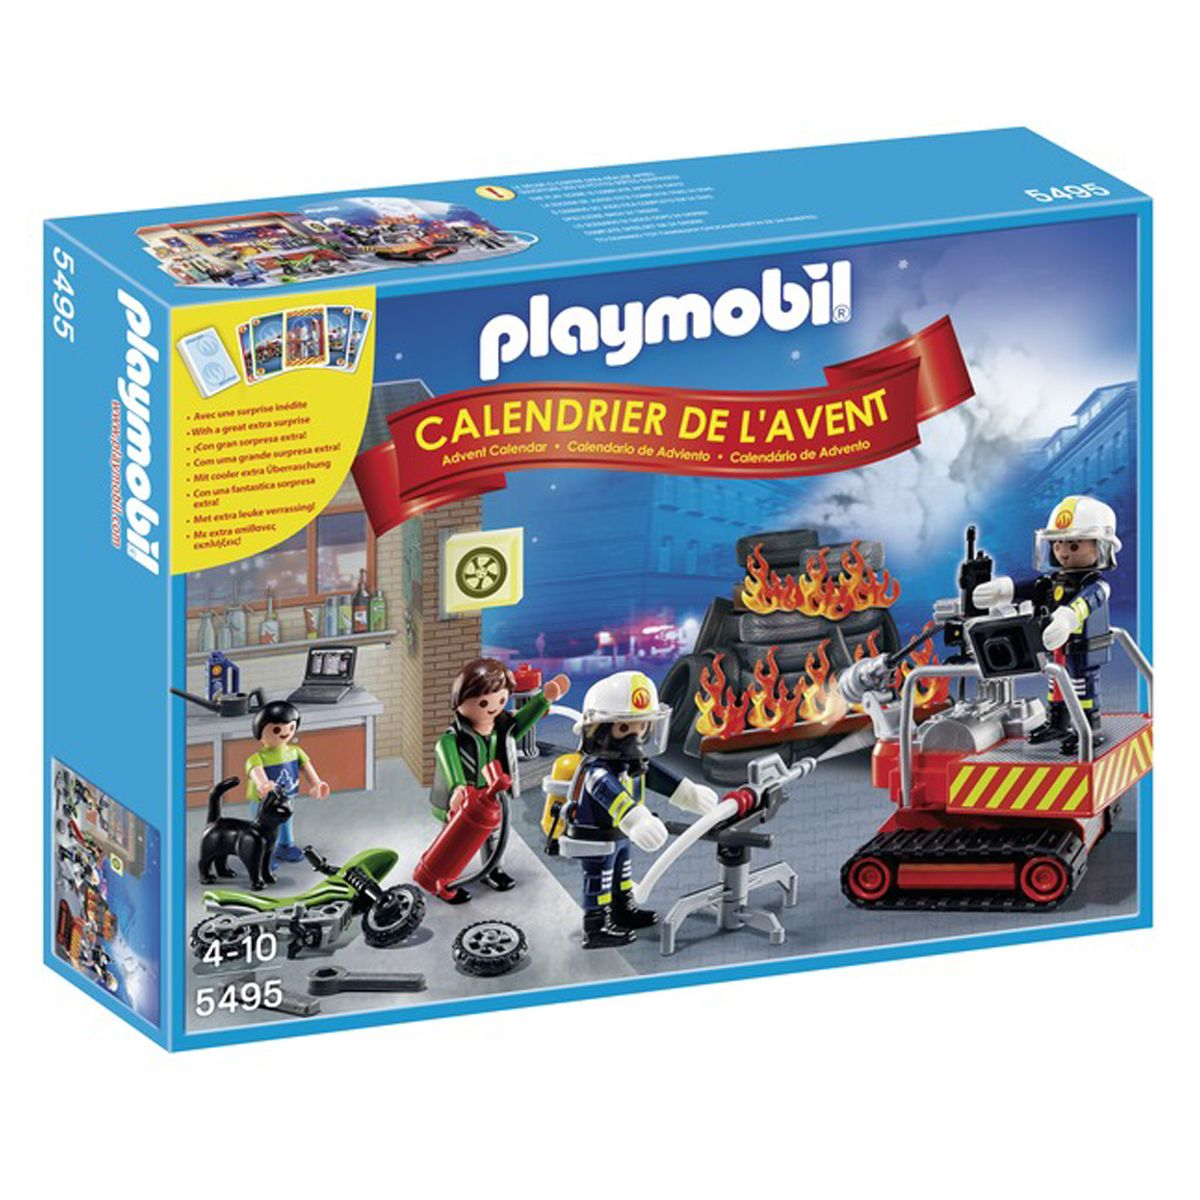 Calendrier L Avent Playmobil.Calendrier De L Avent Playmobil Brigade Des Pompiers 5495